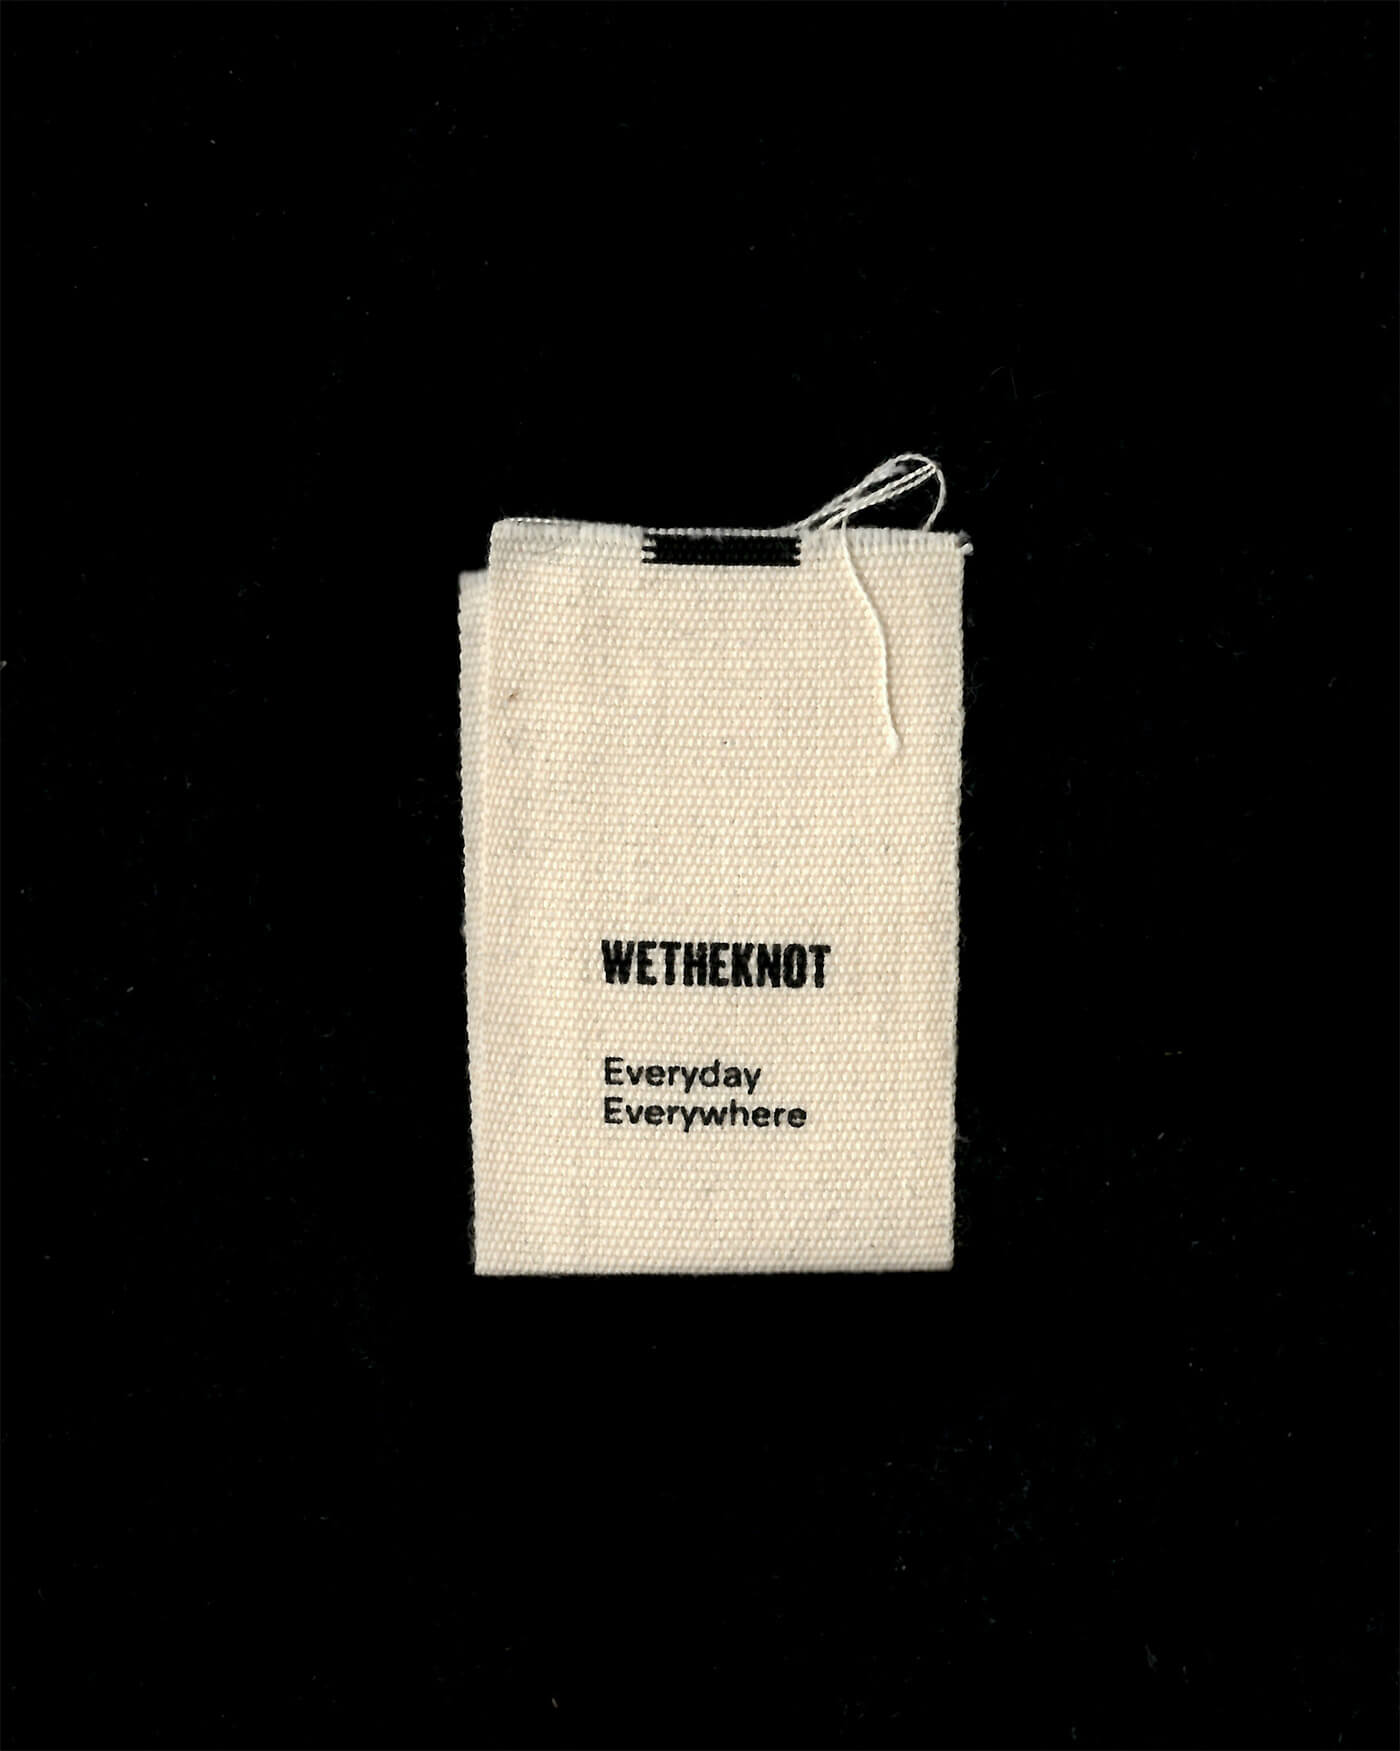 wetheknot label — everyday, everywhere